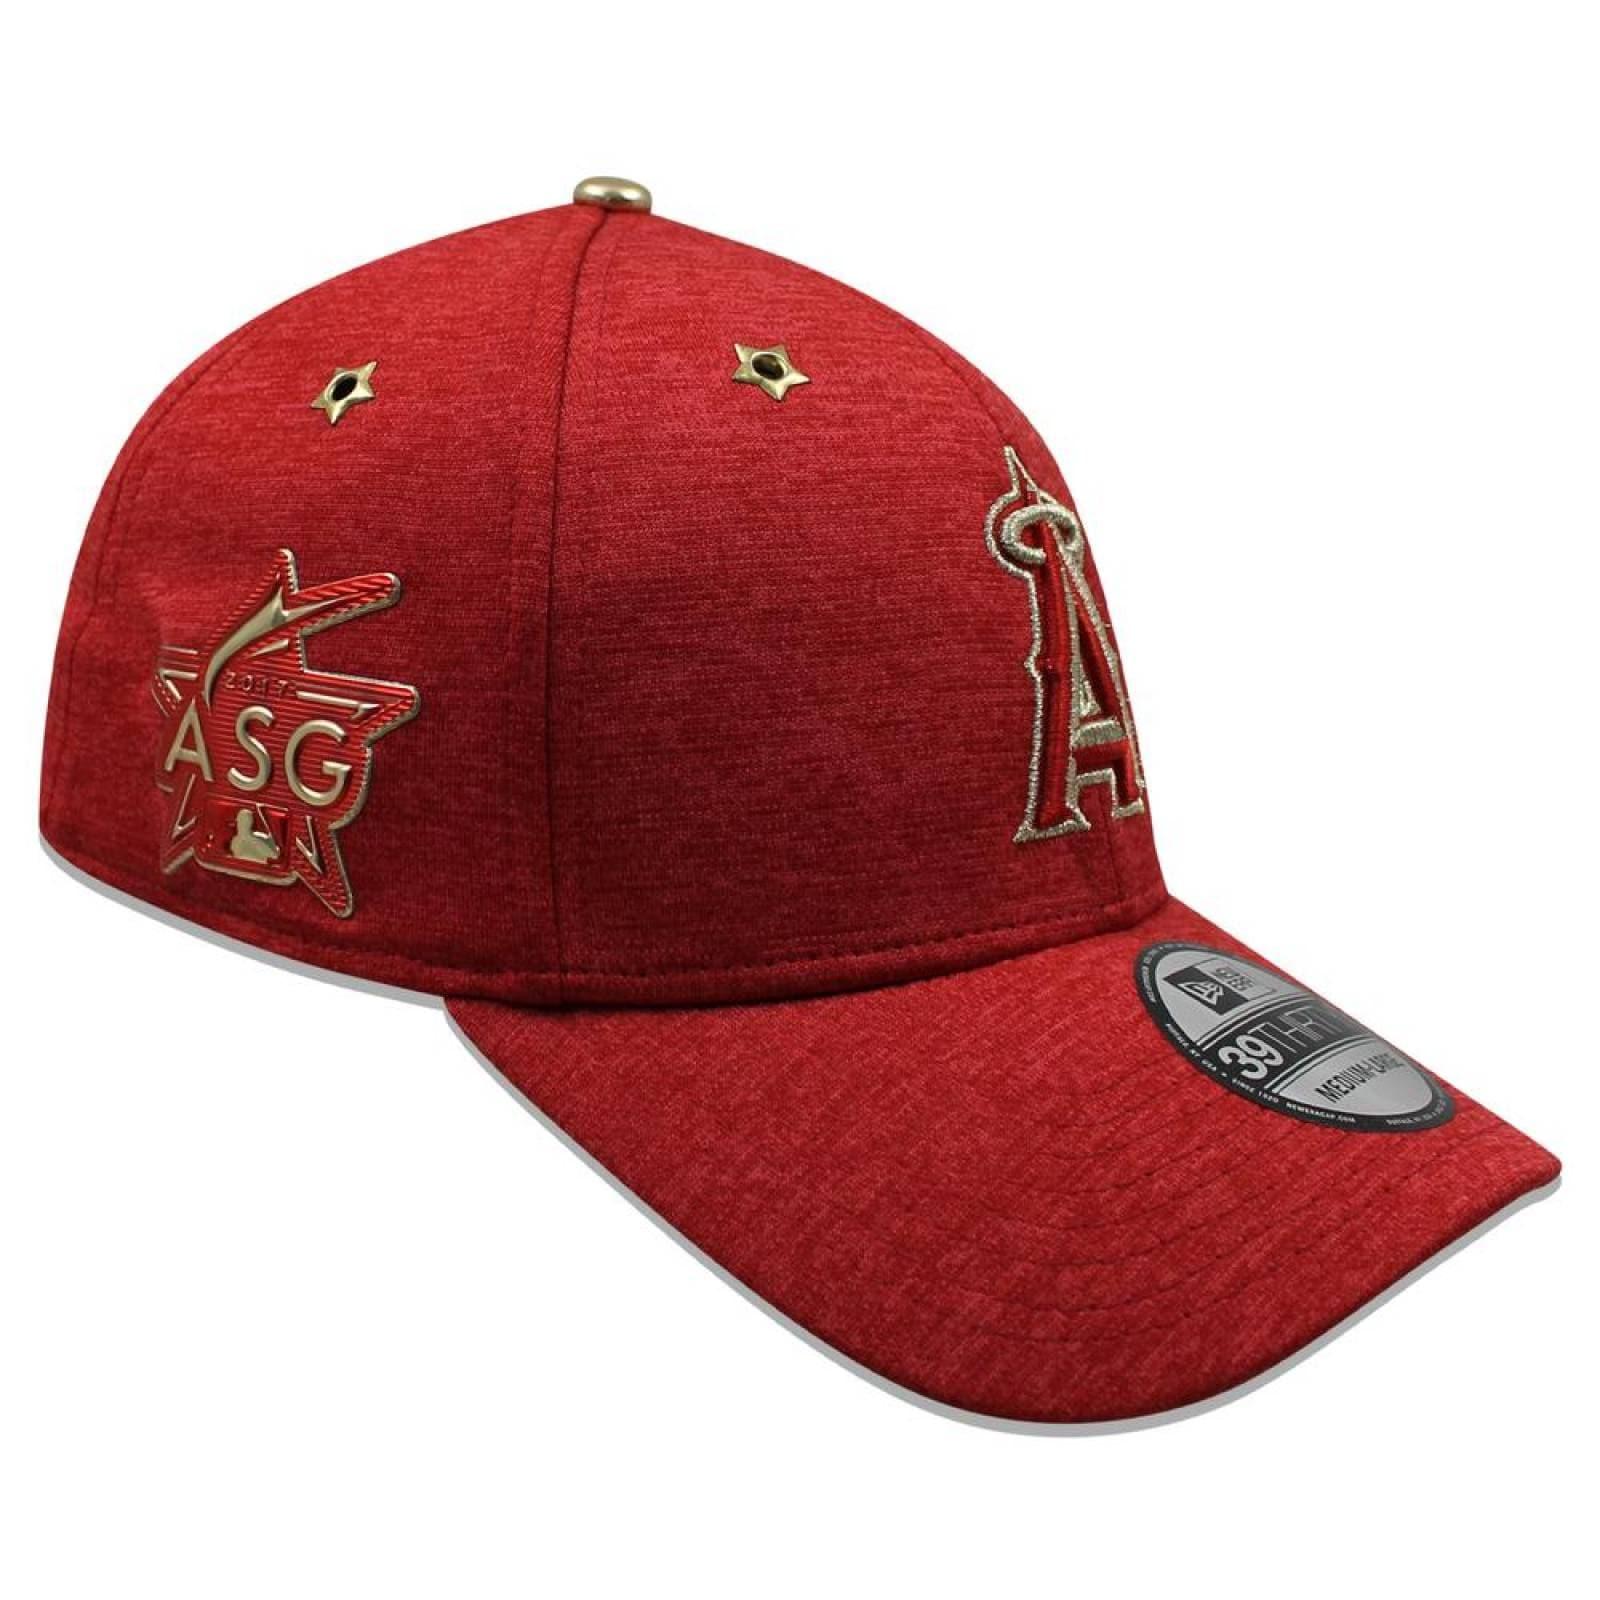 Gorra New Era 39 Thirty MLB 2017 Angels All Star Game Rojo